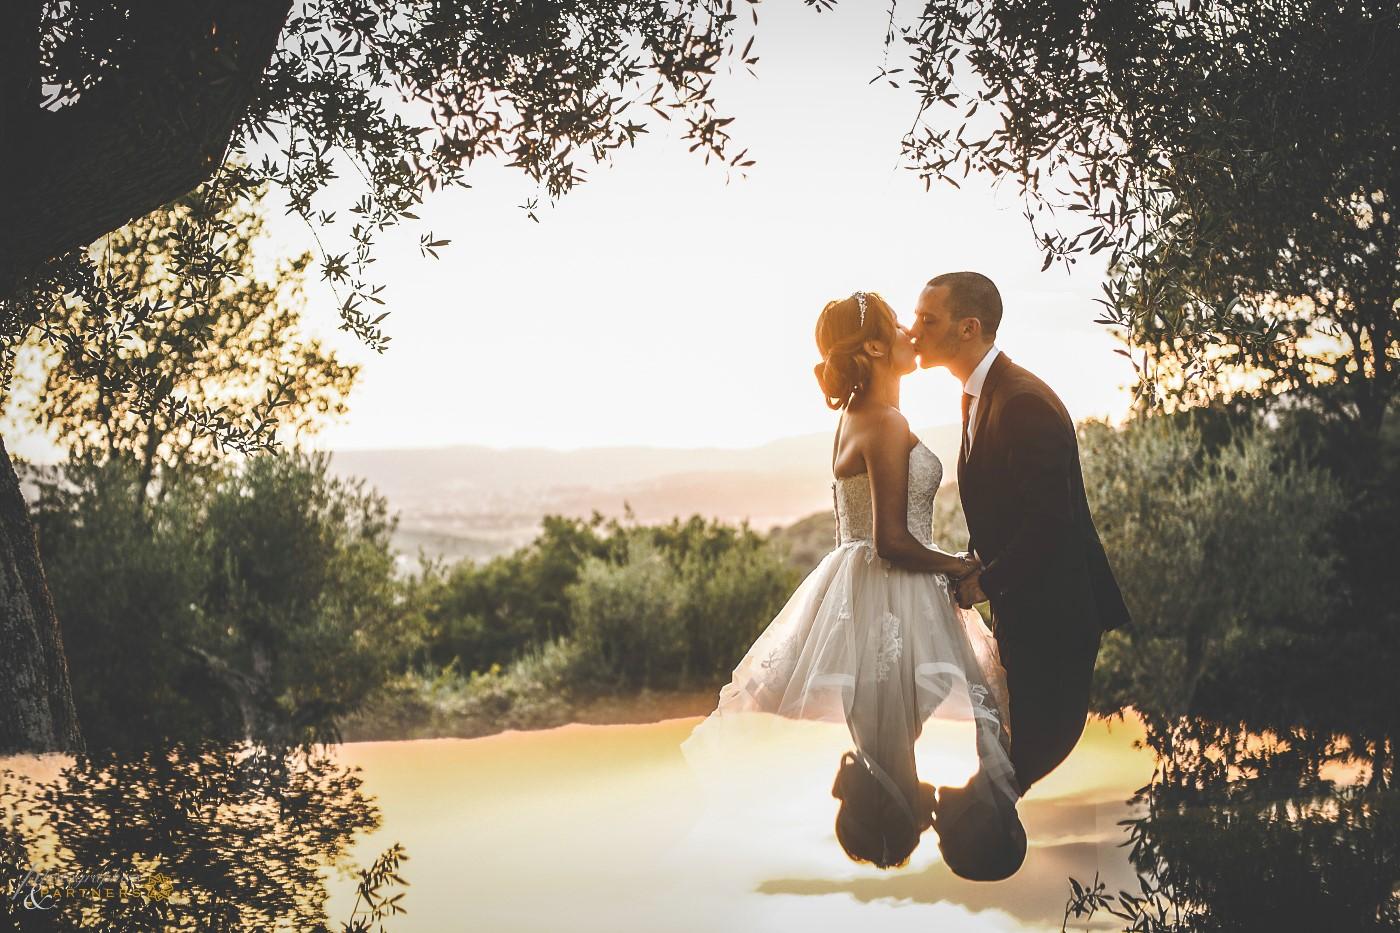 Romantic kiss at sunset.